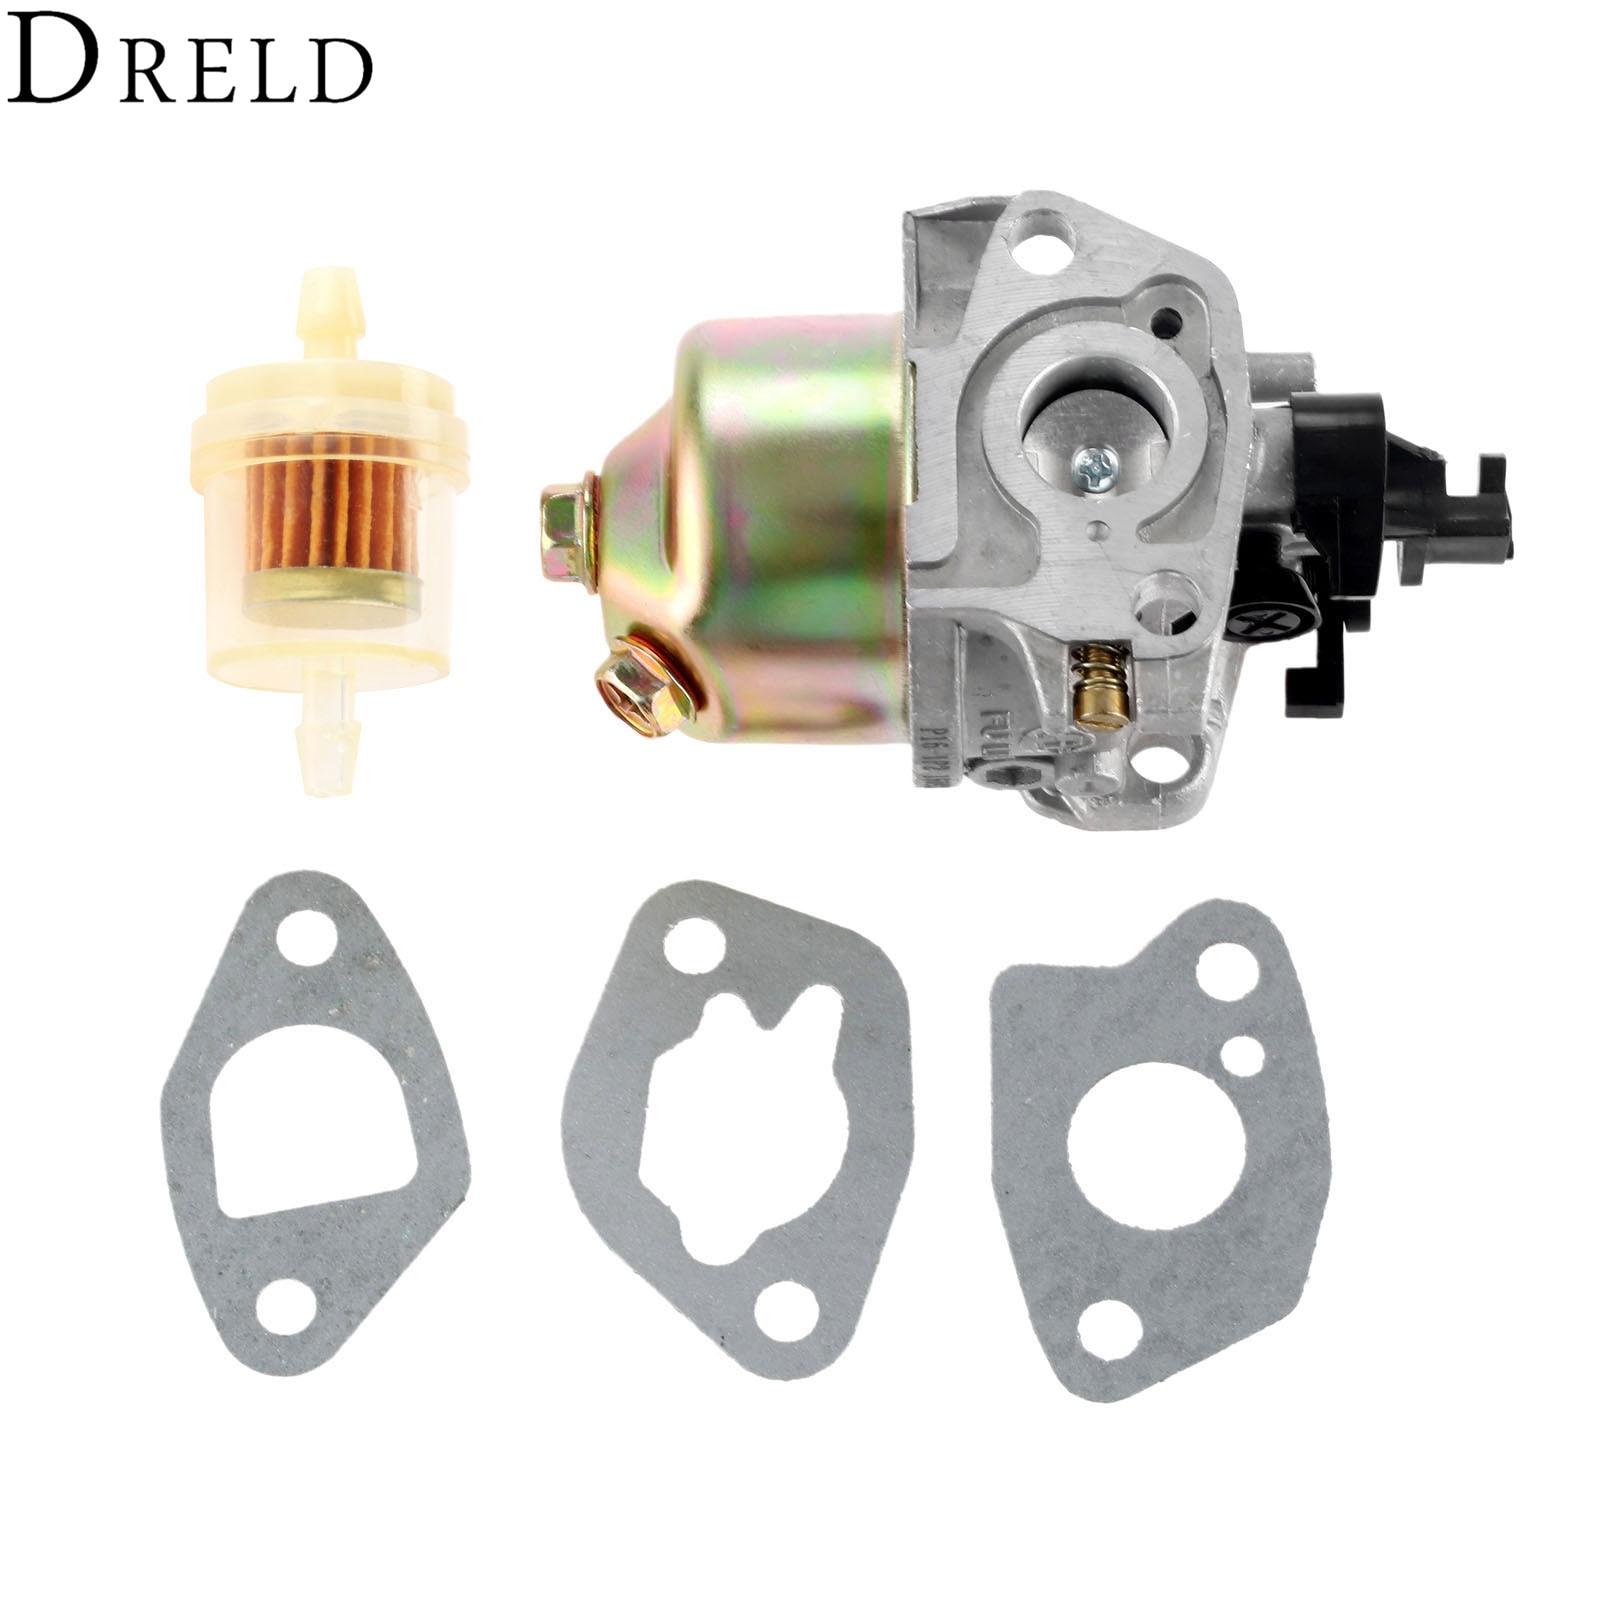 hight resolution of dreld carburetor with carburetor gasket fuel filter for mtd cub cadet troy bilt lawn mower